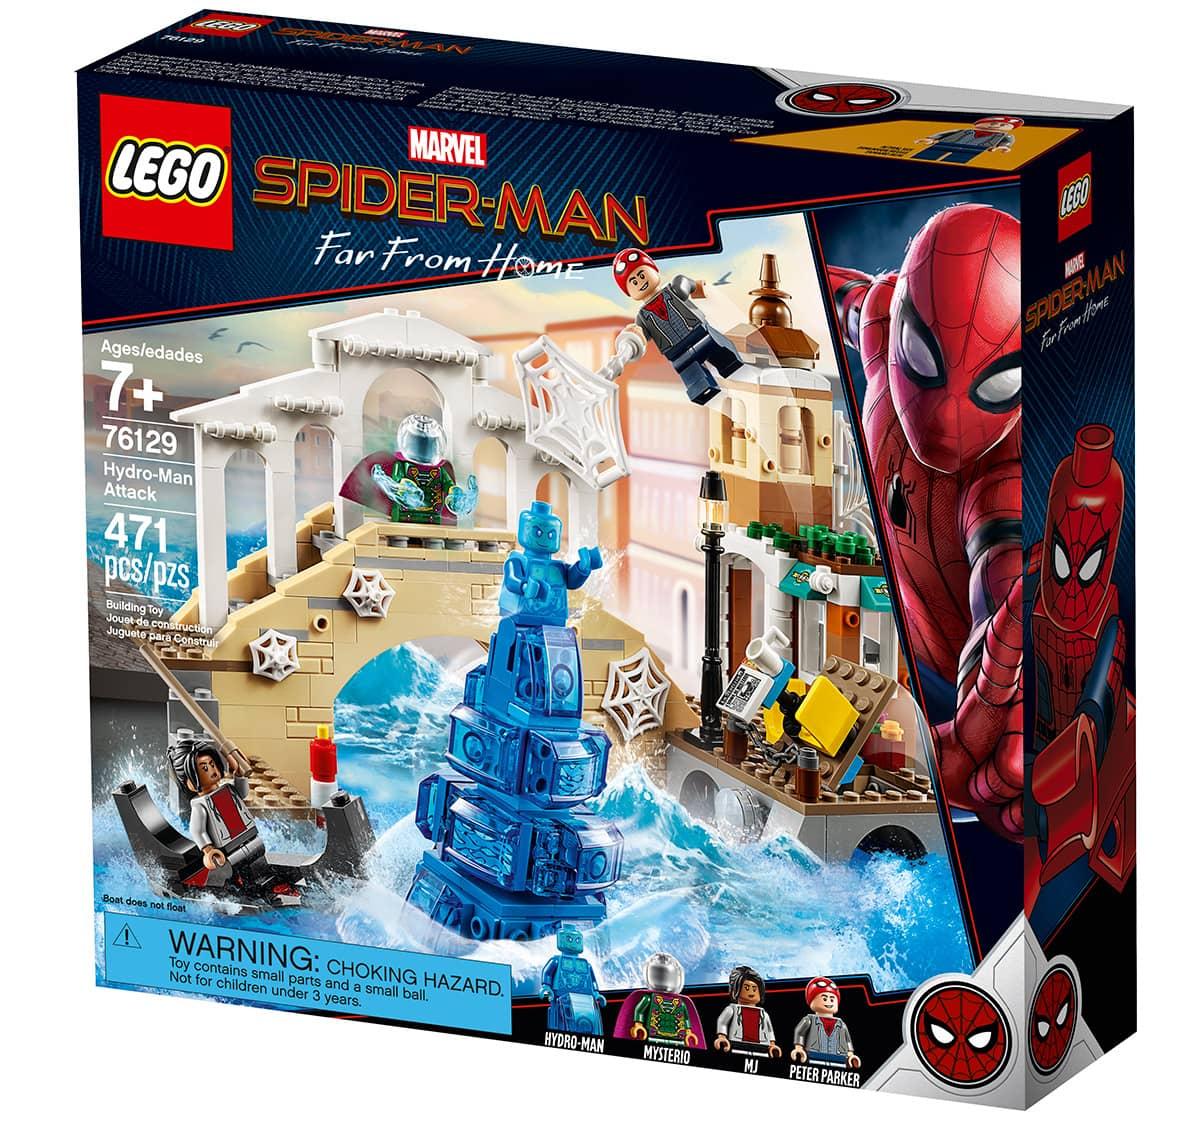 LEGO Spider-Man Hydro-Man Attack 76129